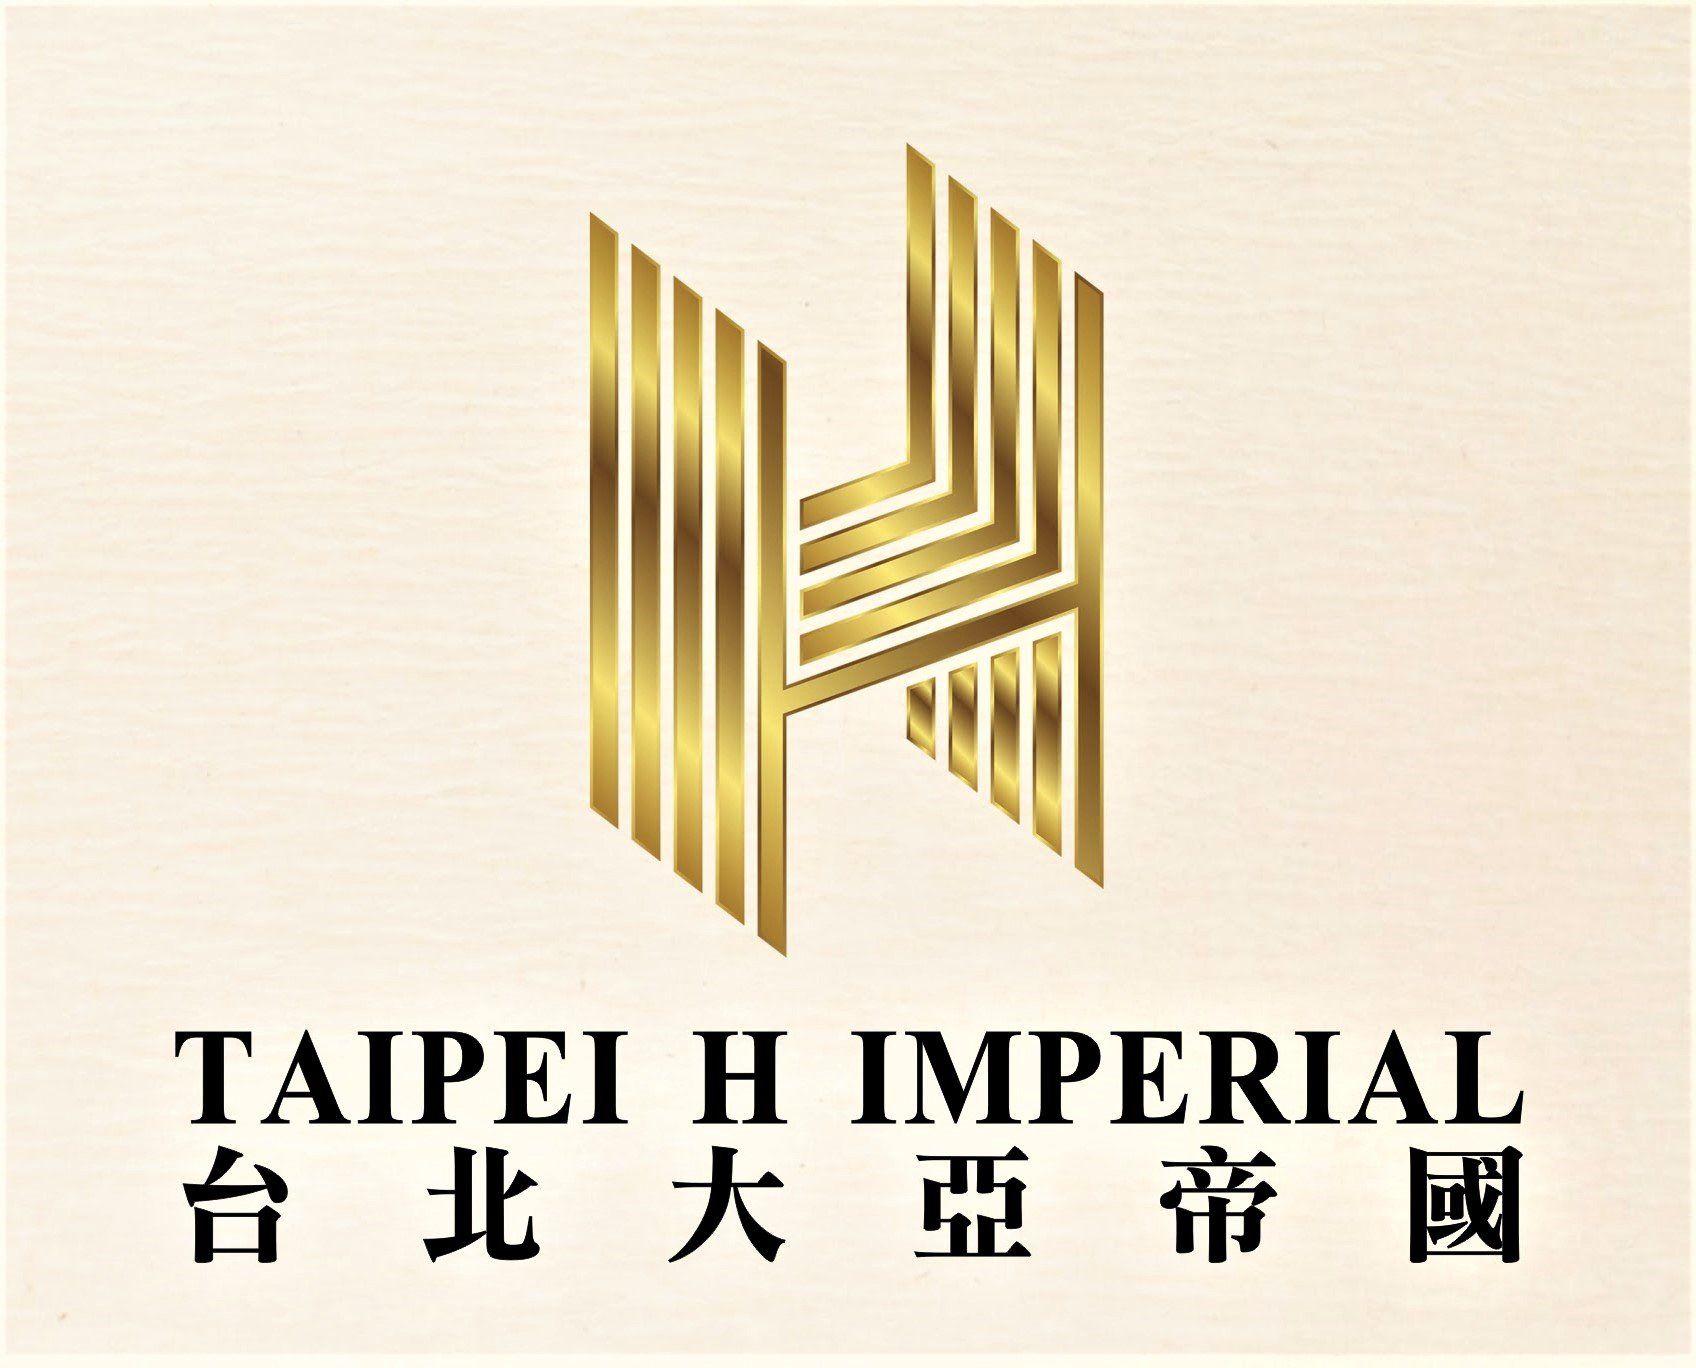 Taipei H Imperial